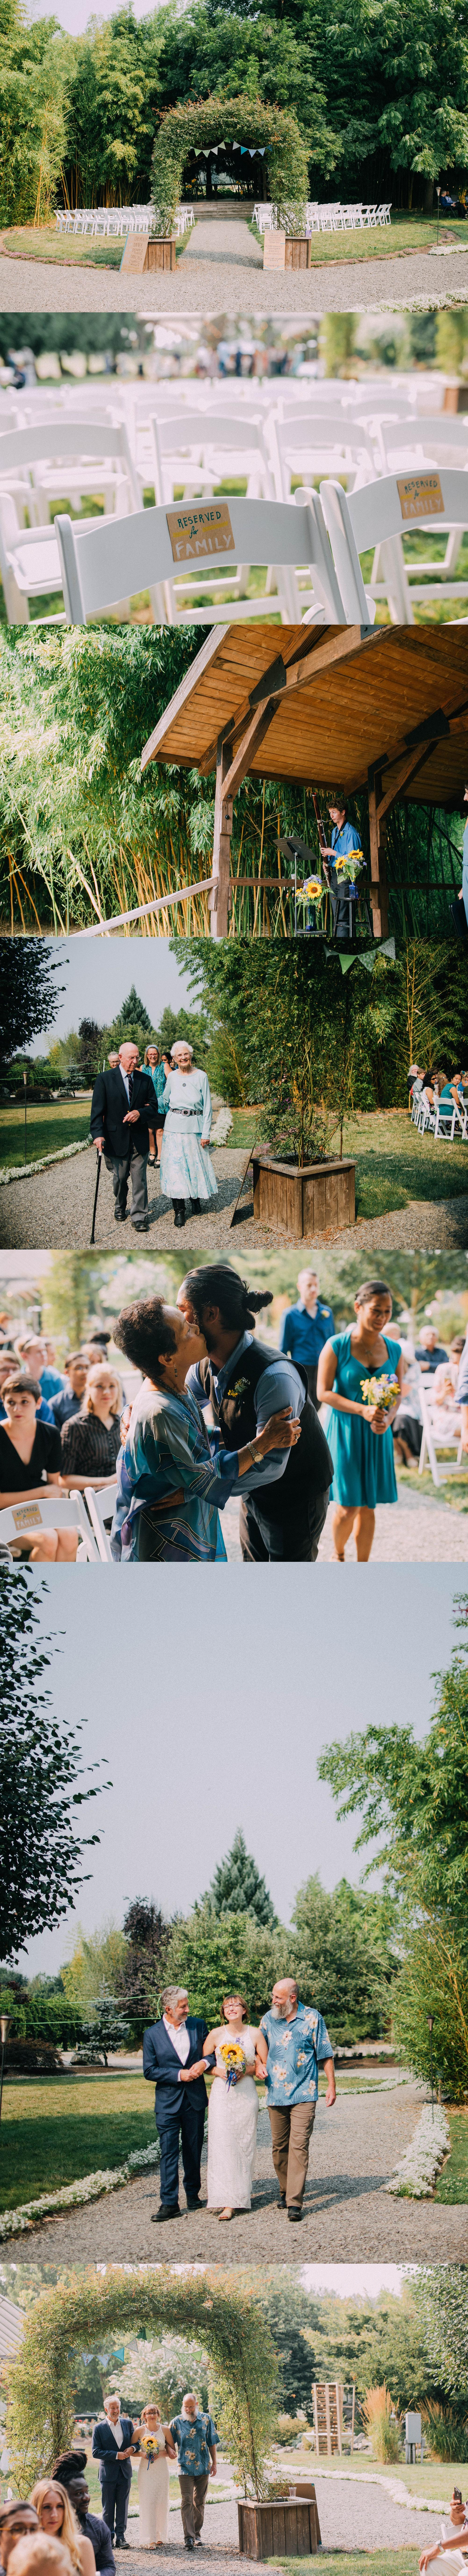 ashley_vos_seattle_ wedding_photographer_0463.jpg